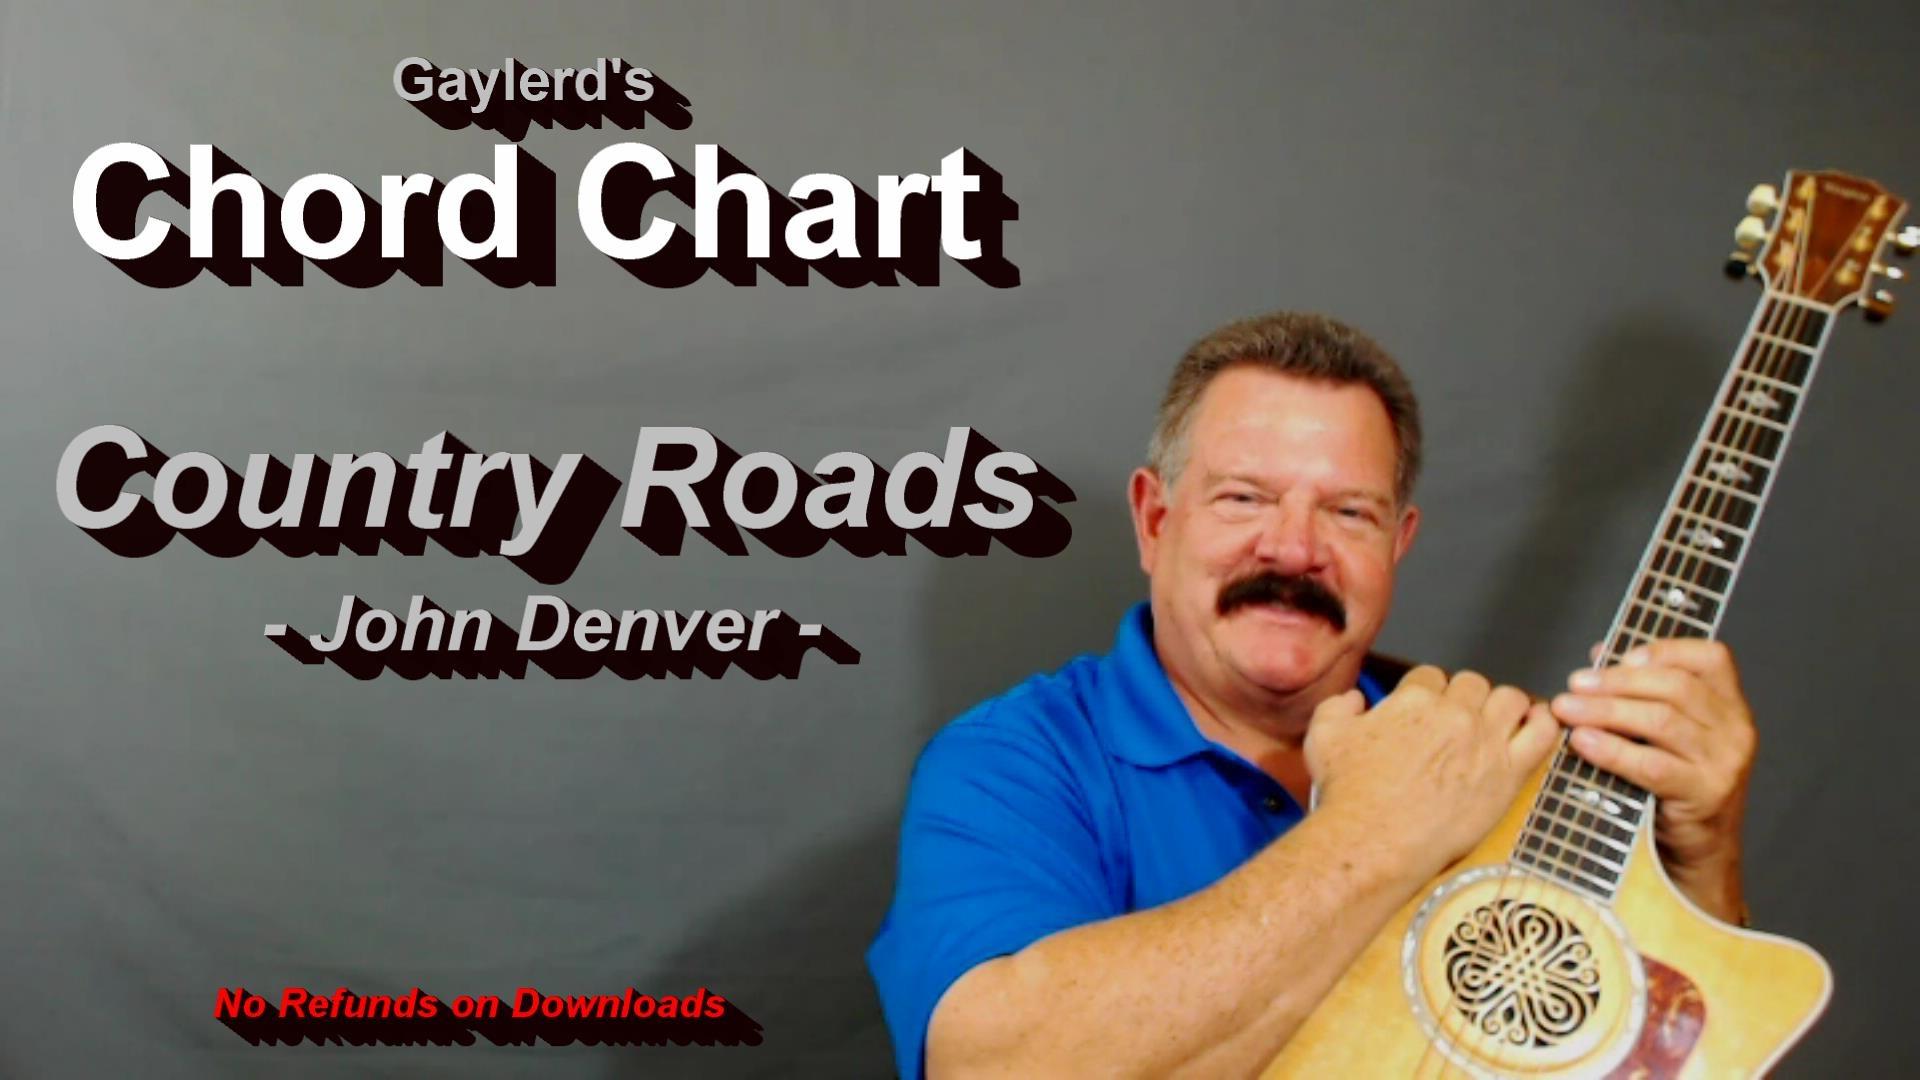 Country Roads - John Denver (CHORD CHART)